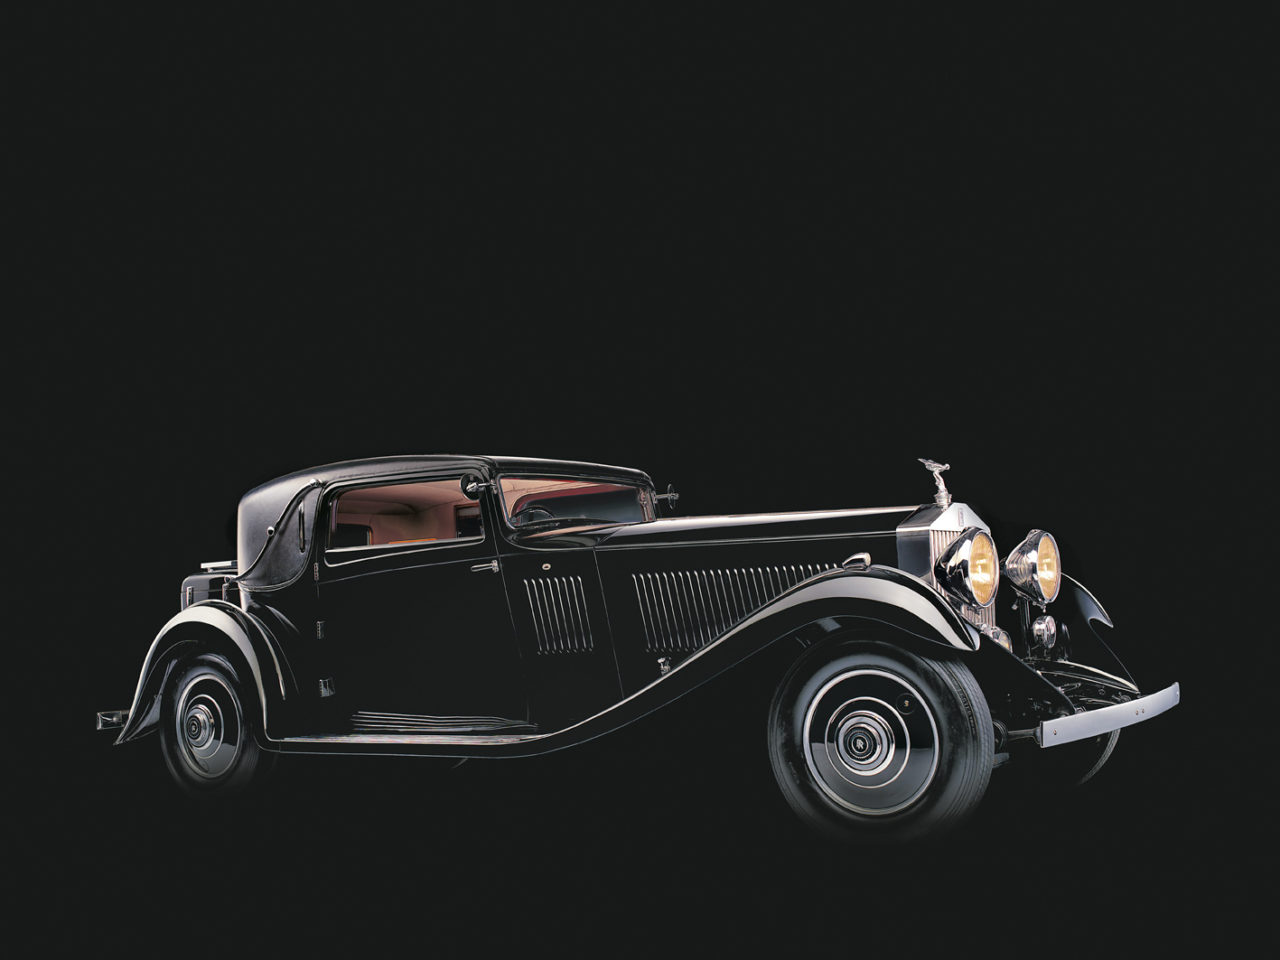 Rolls-Royce Phantom II Continental © BMW Group, Foto: Johannes Riedel